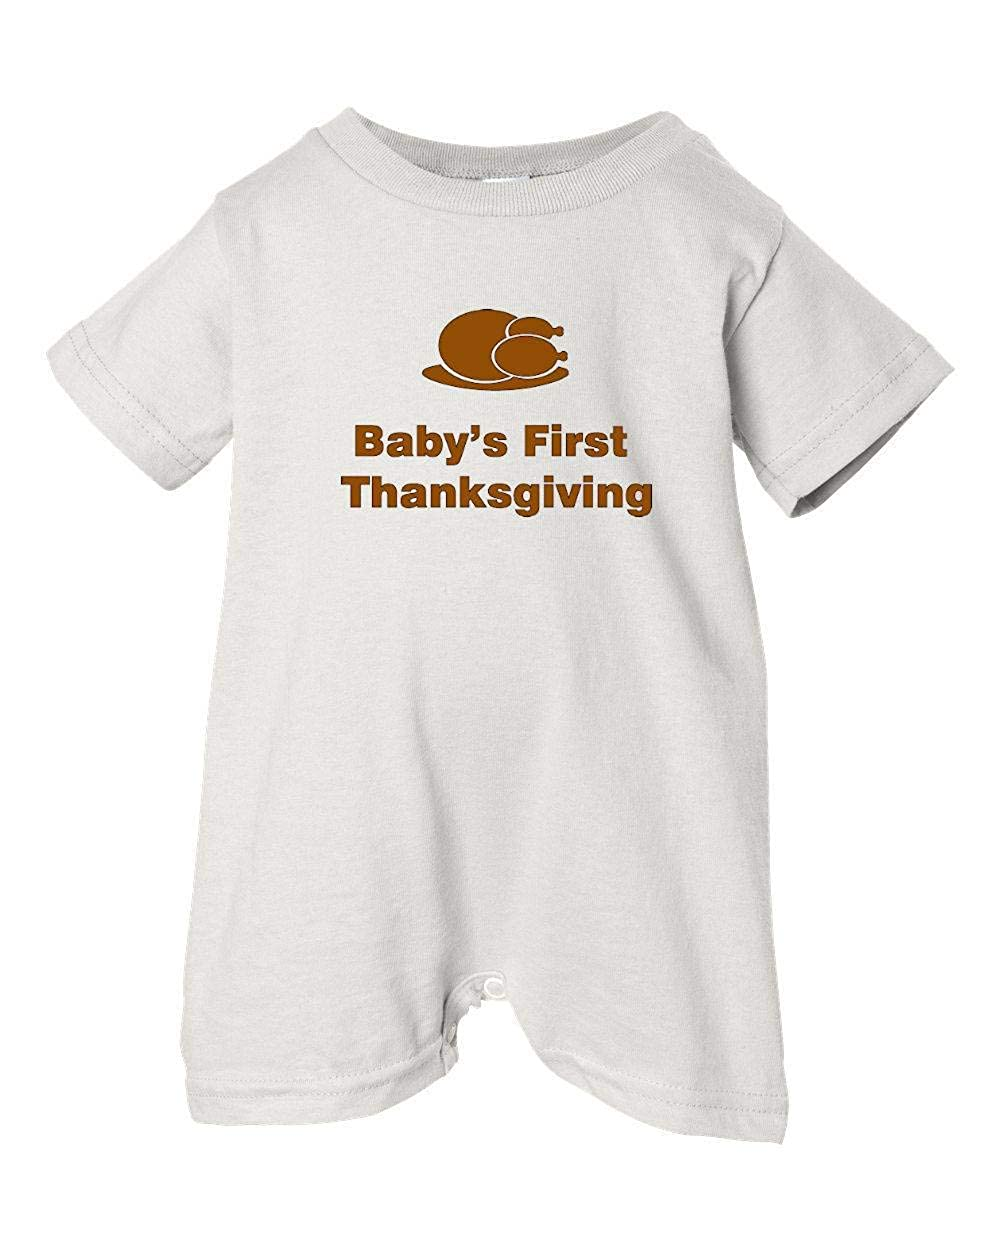 T-Shirt Romper White, 12 Months Dinner Festive Threads Unisex Baby Babys First Thanksgiving